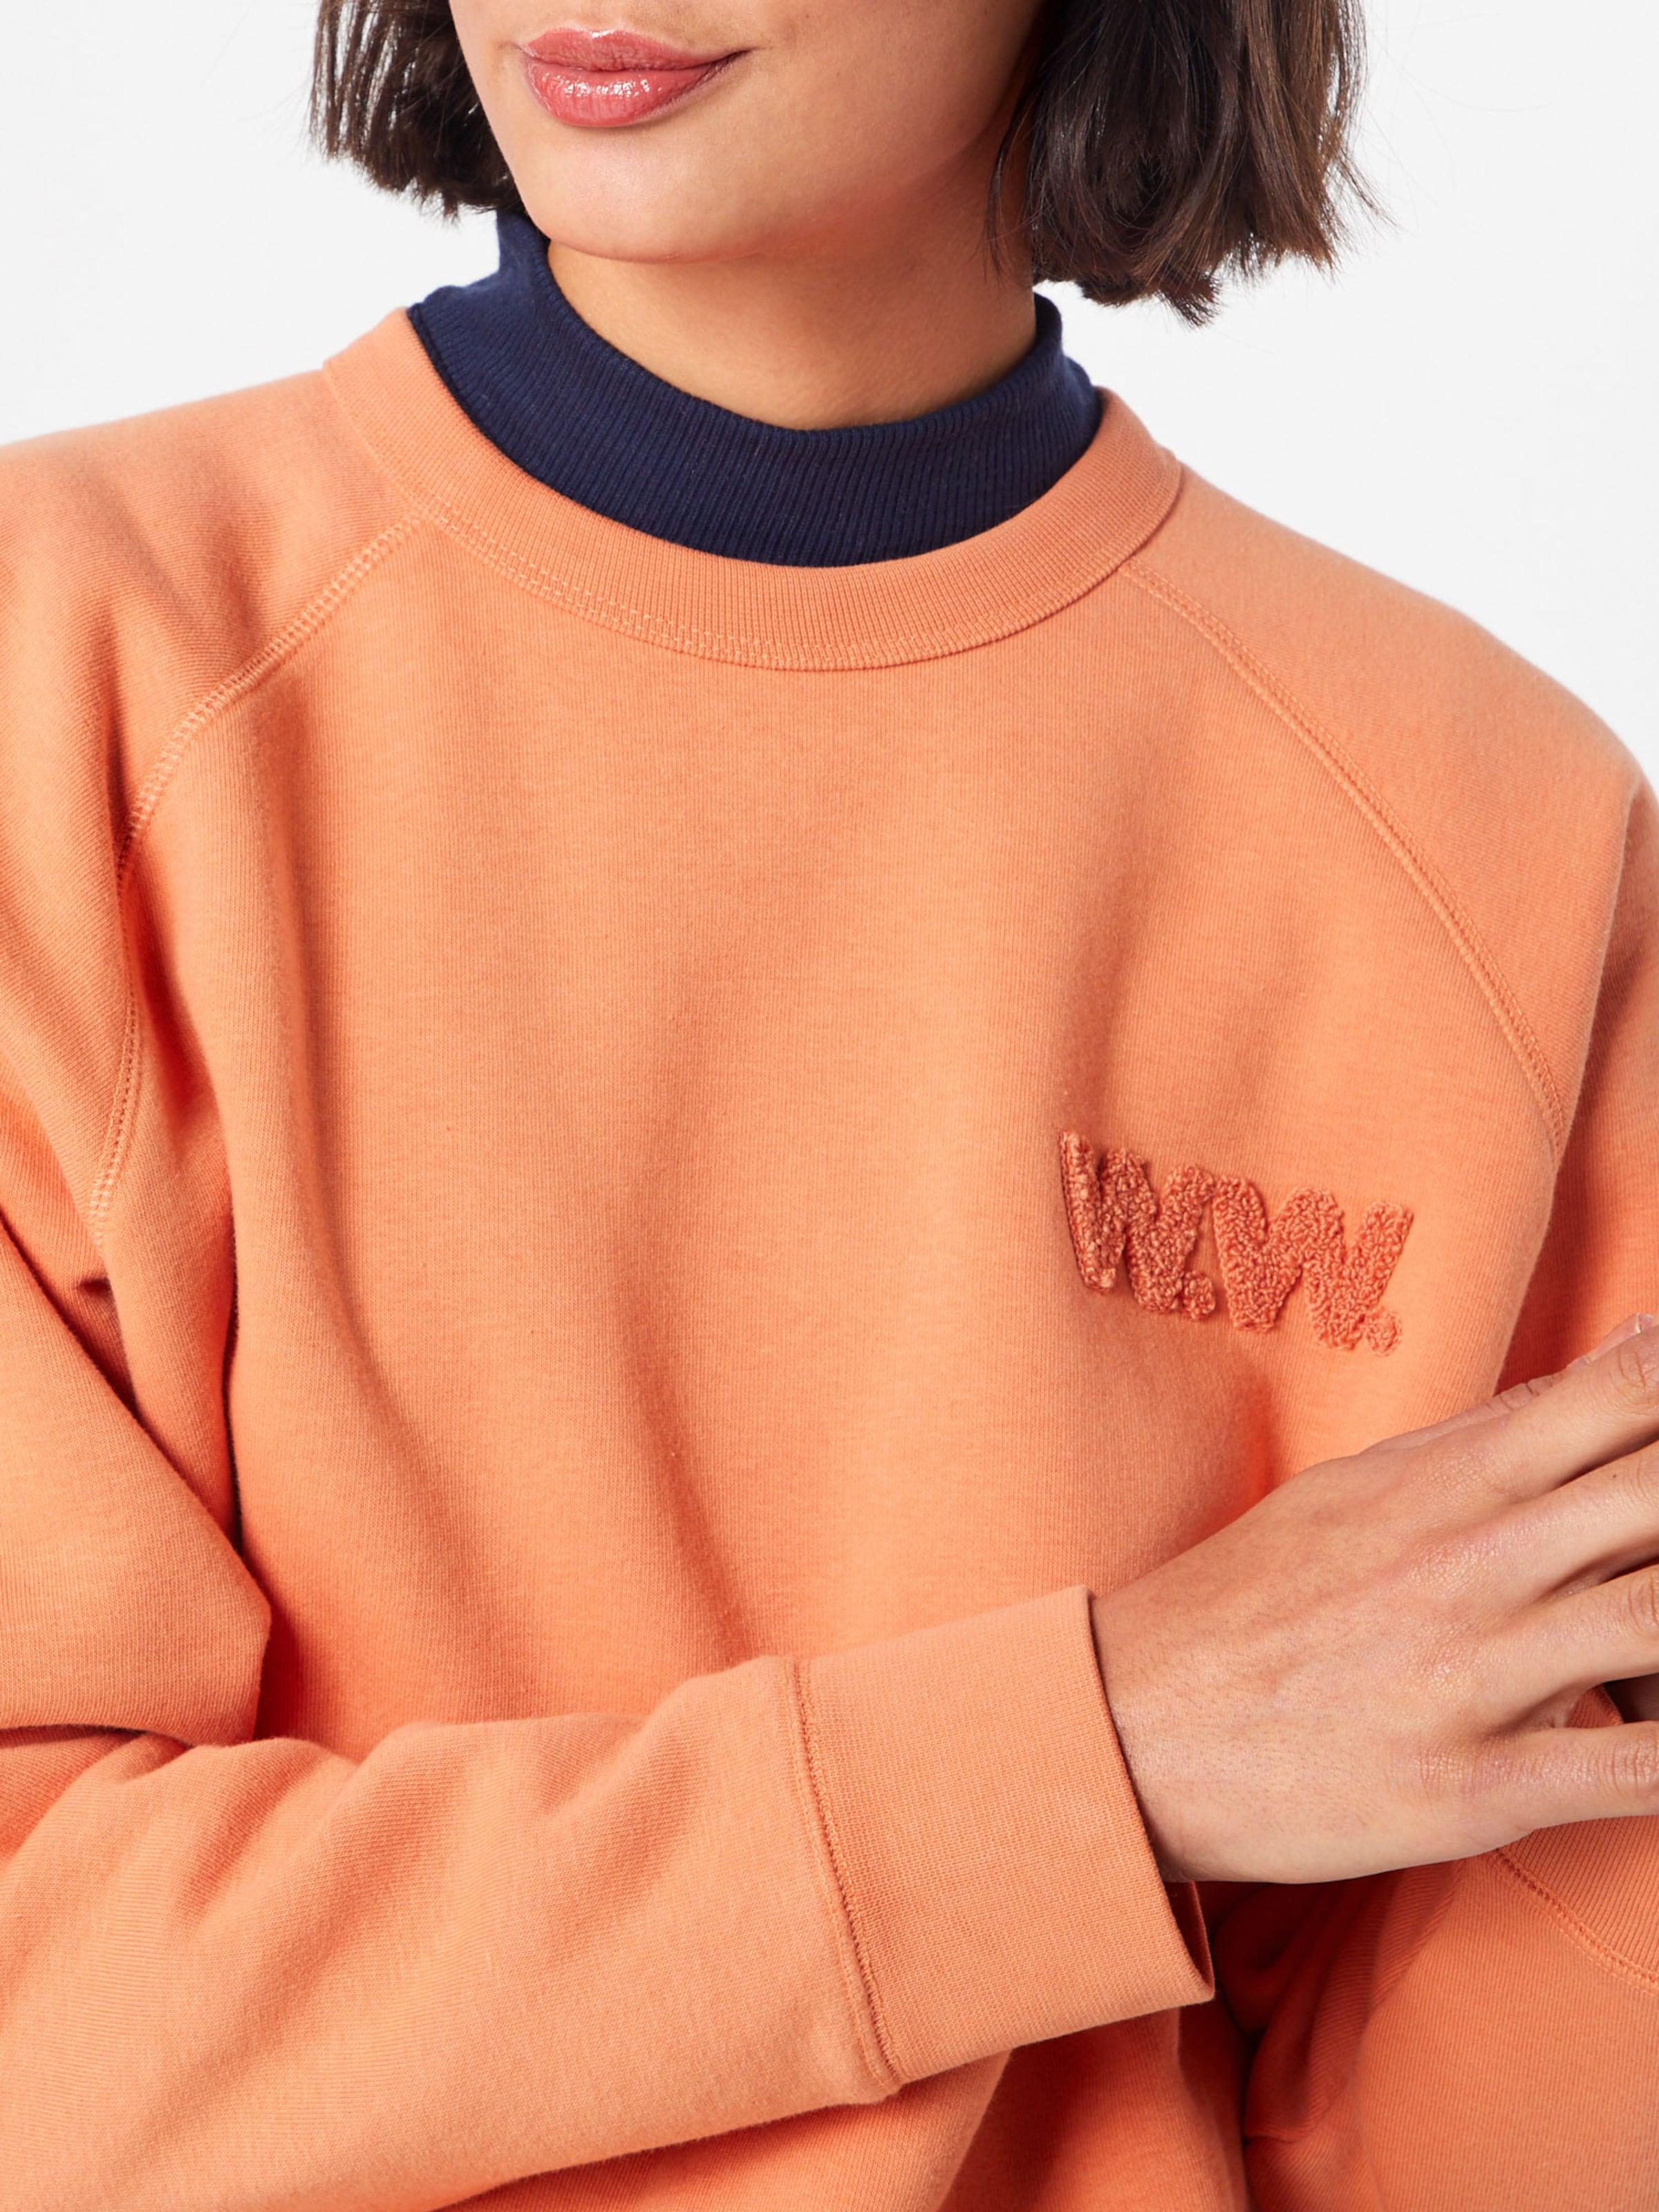 En Sweat Rouge 'jerri' Wood shirt Clair qUzMVpGLS